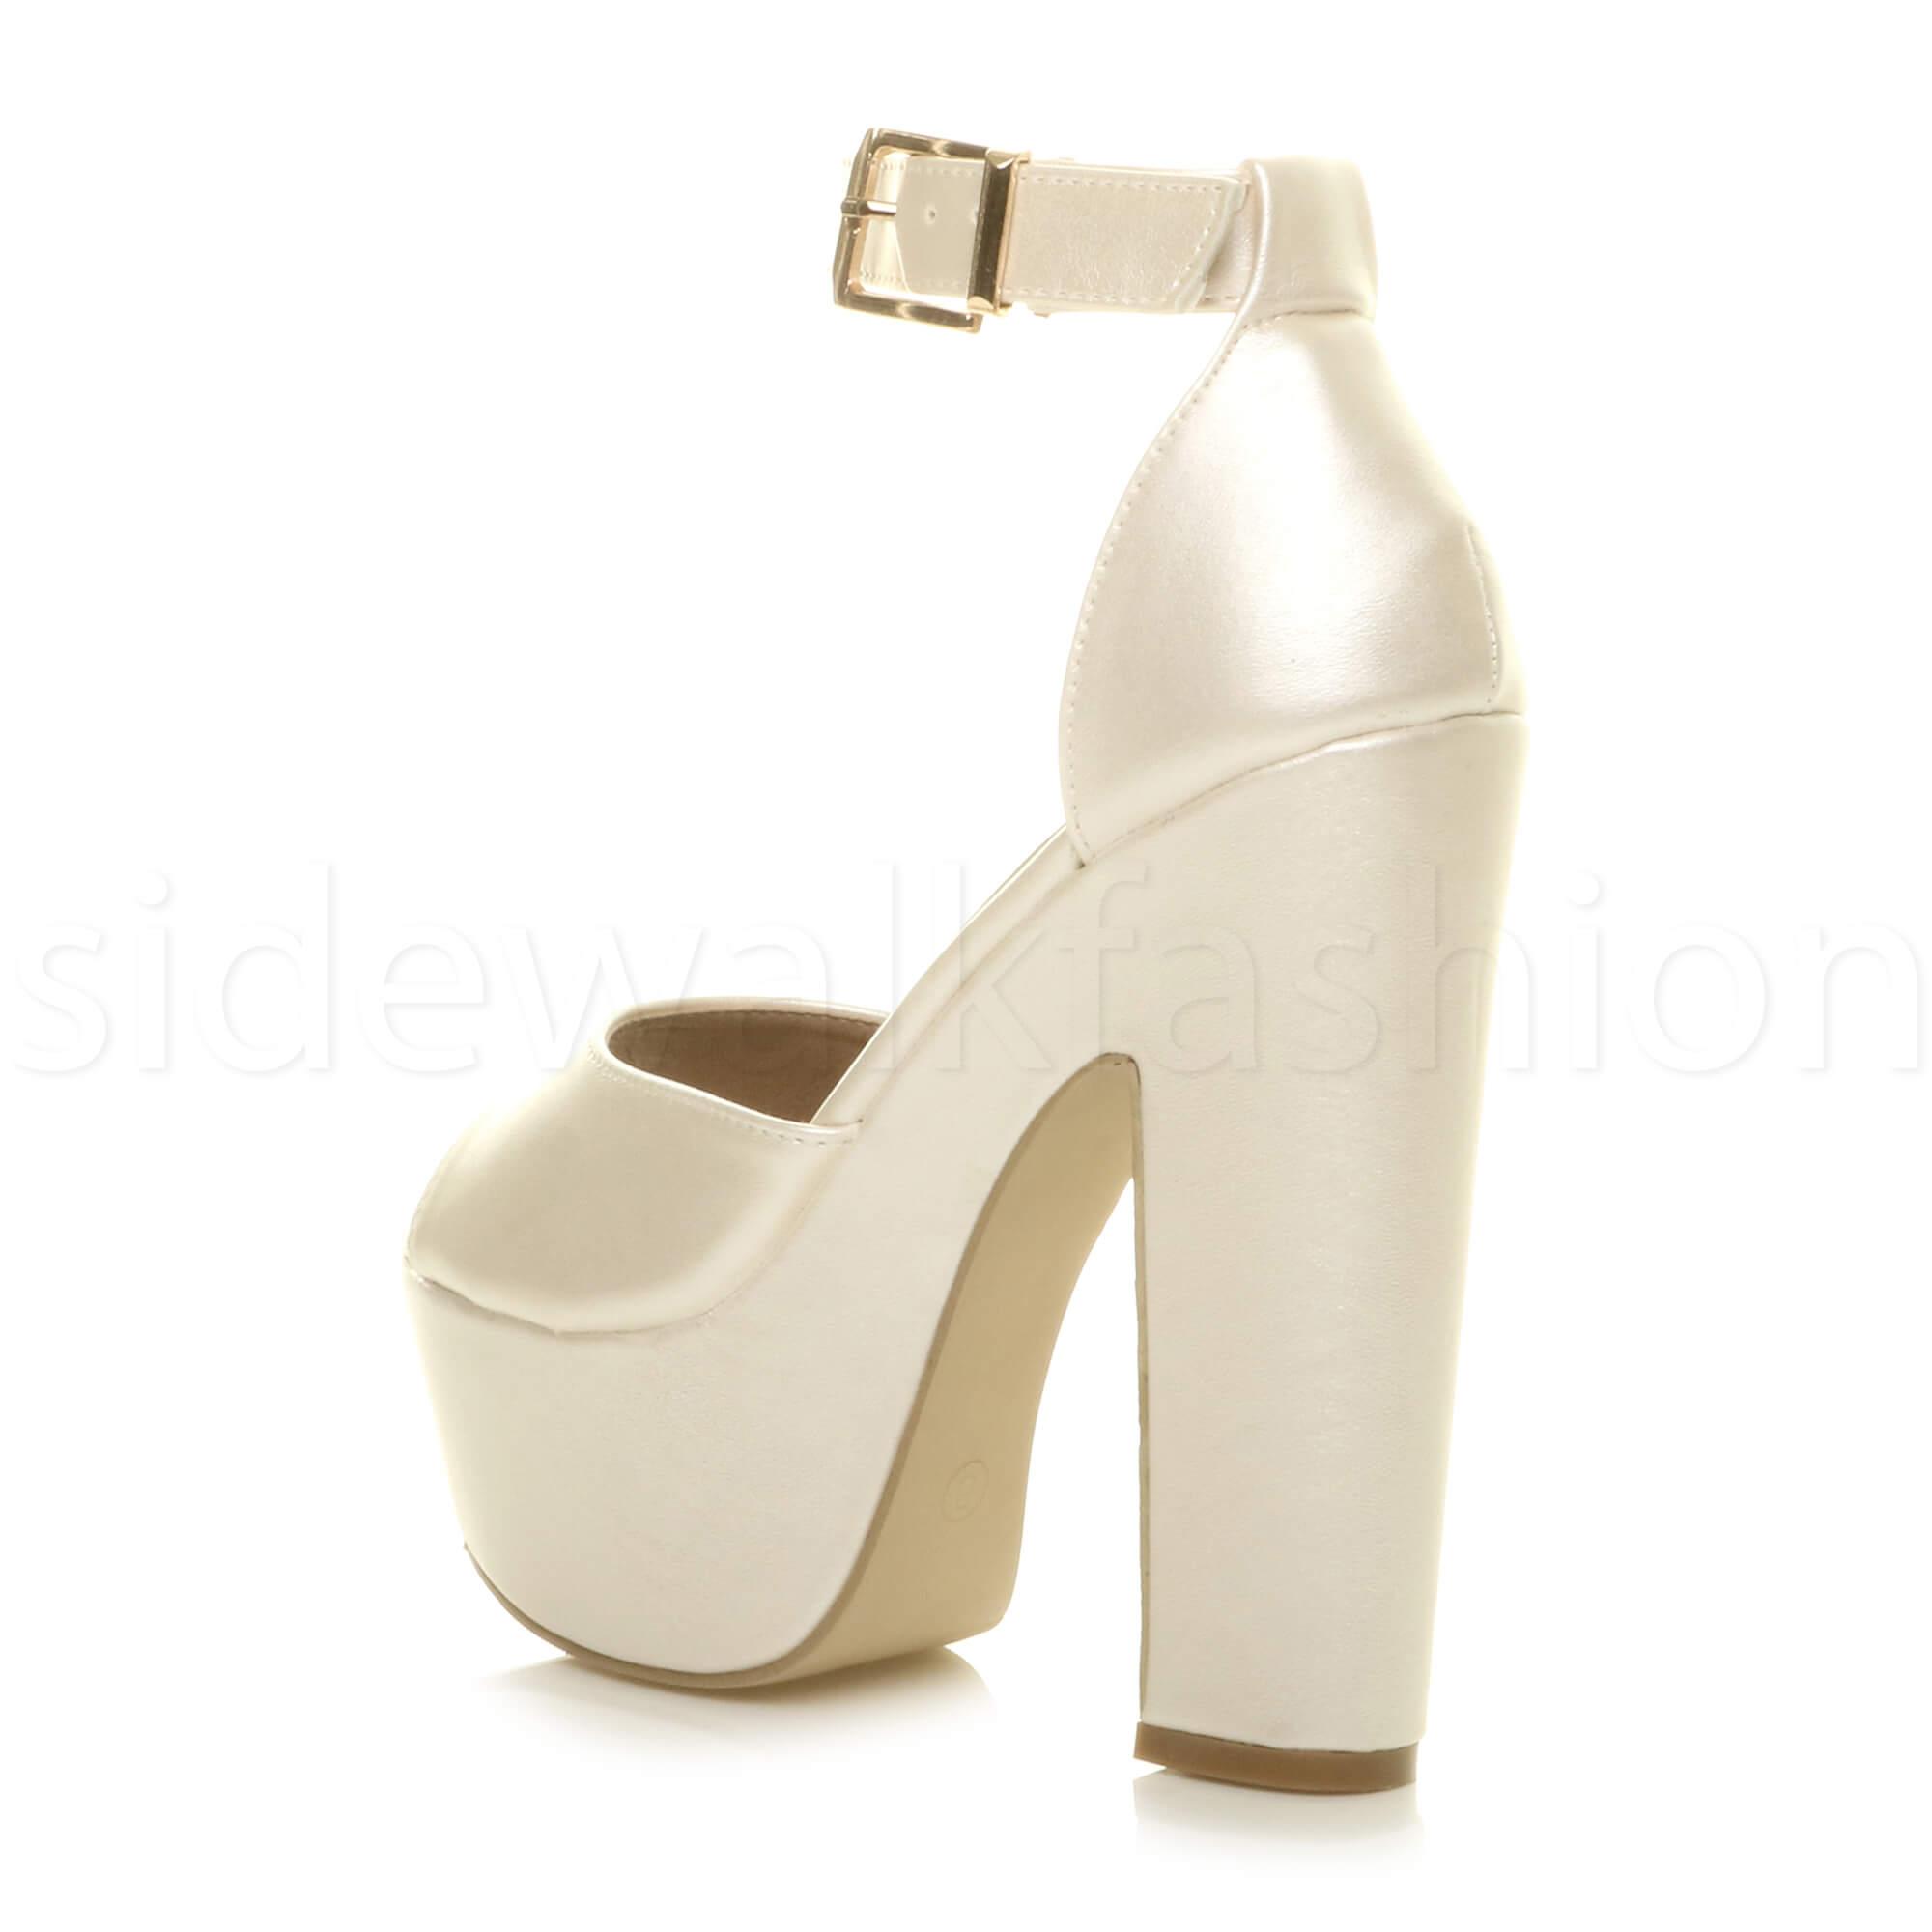 Womens-ladies-high-block-heel-peep-toe-shoes-evening-party-platform-sandals-size thumbnail 30